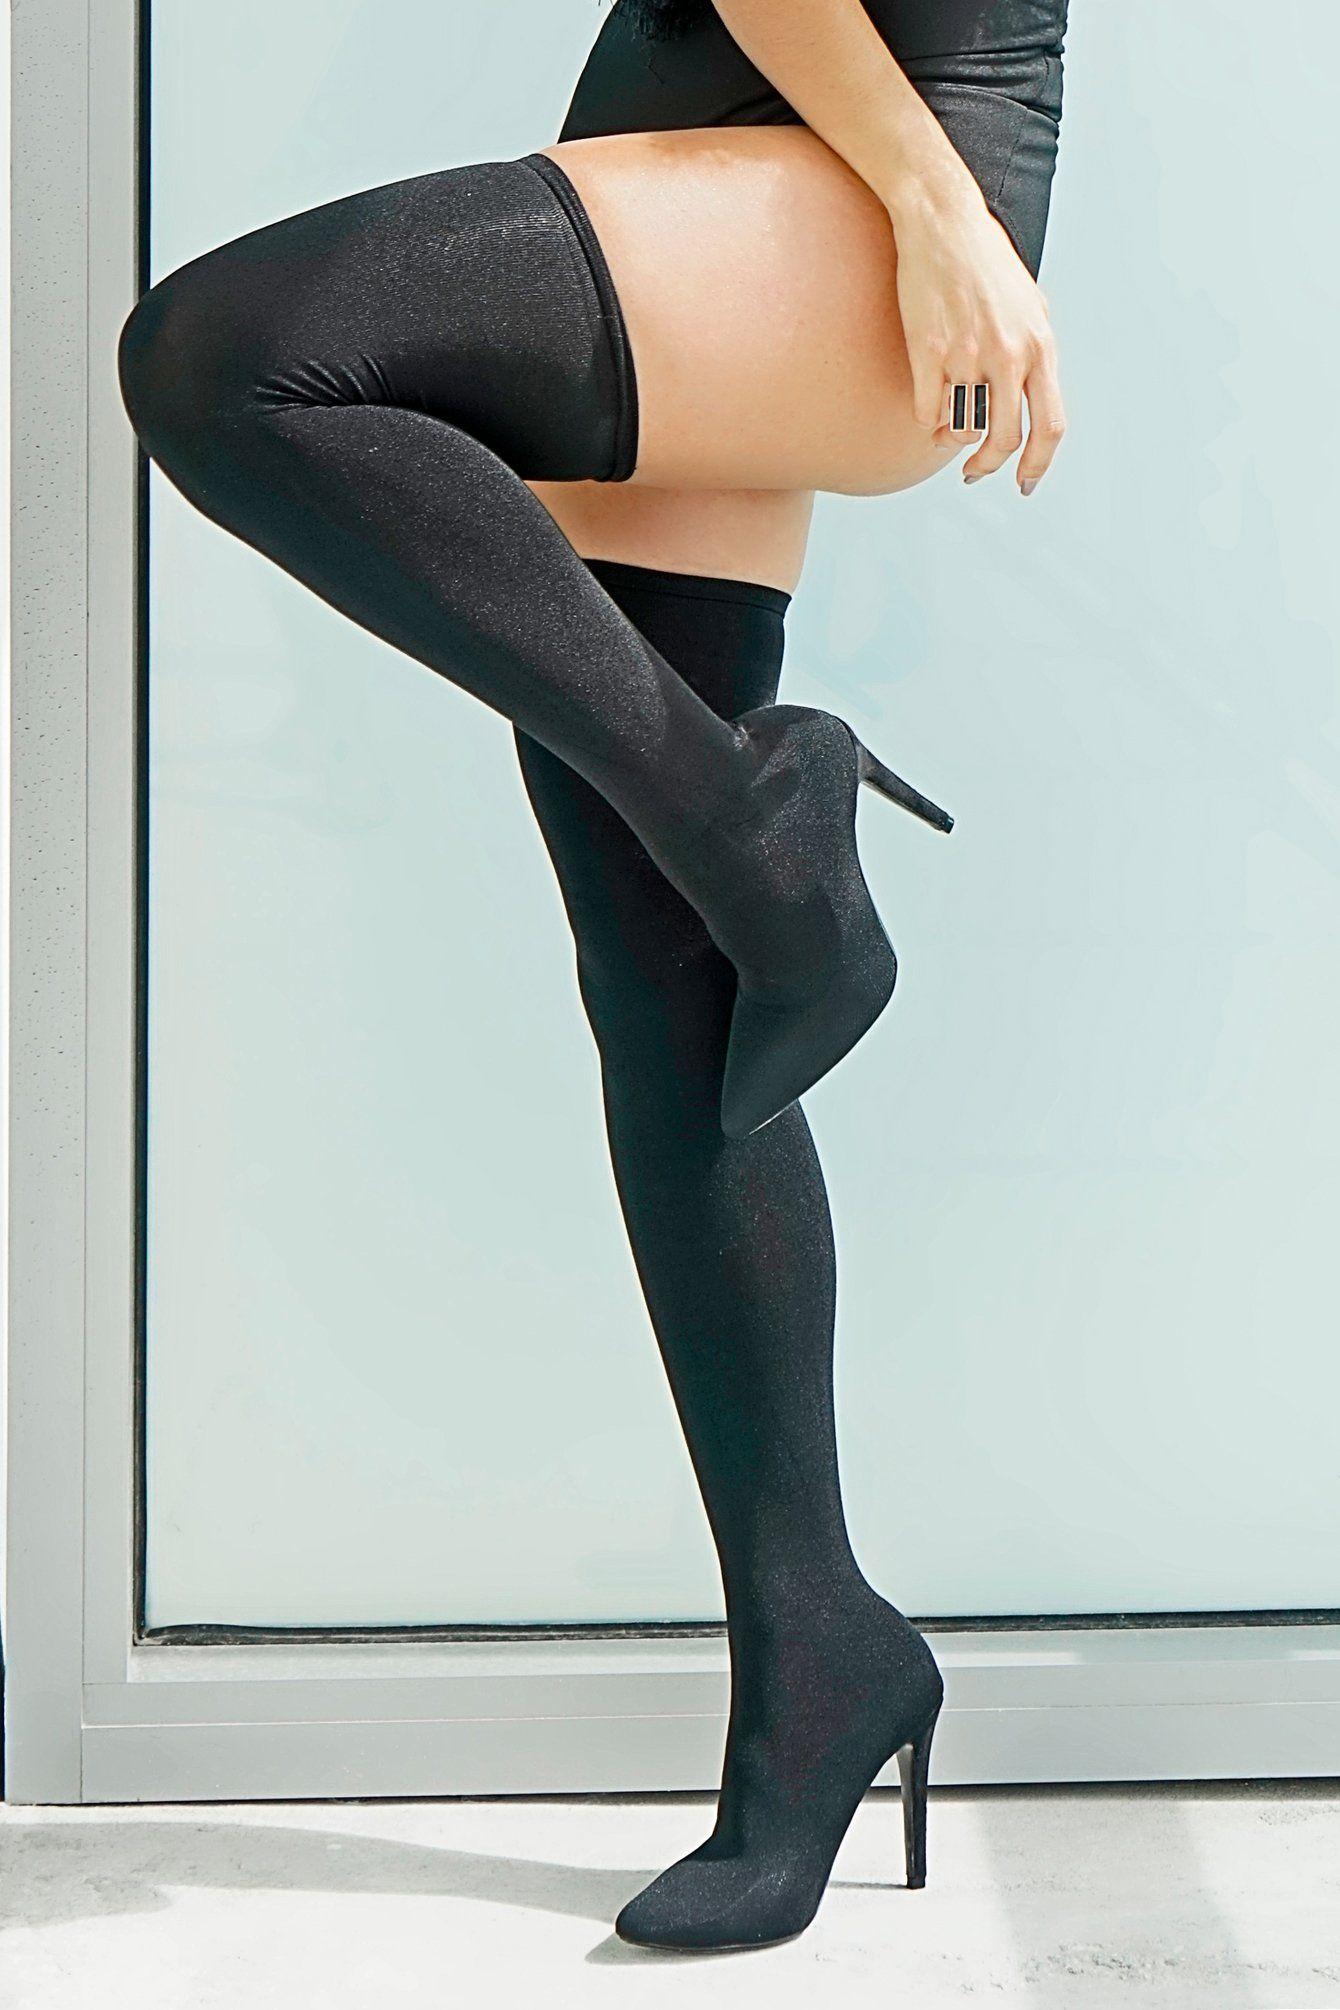 Leather Dress High Heels